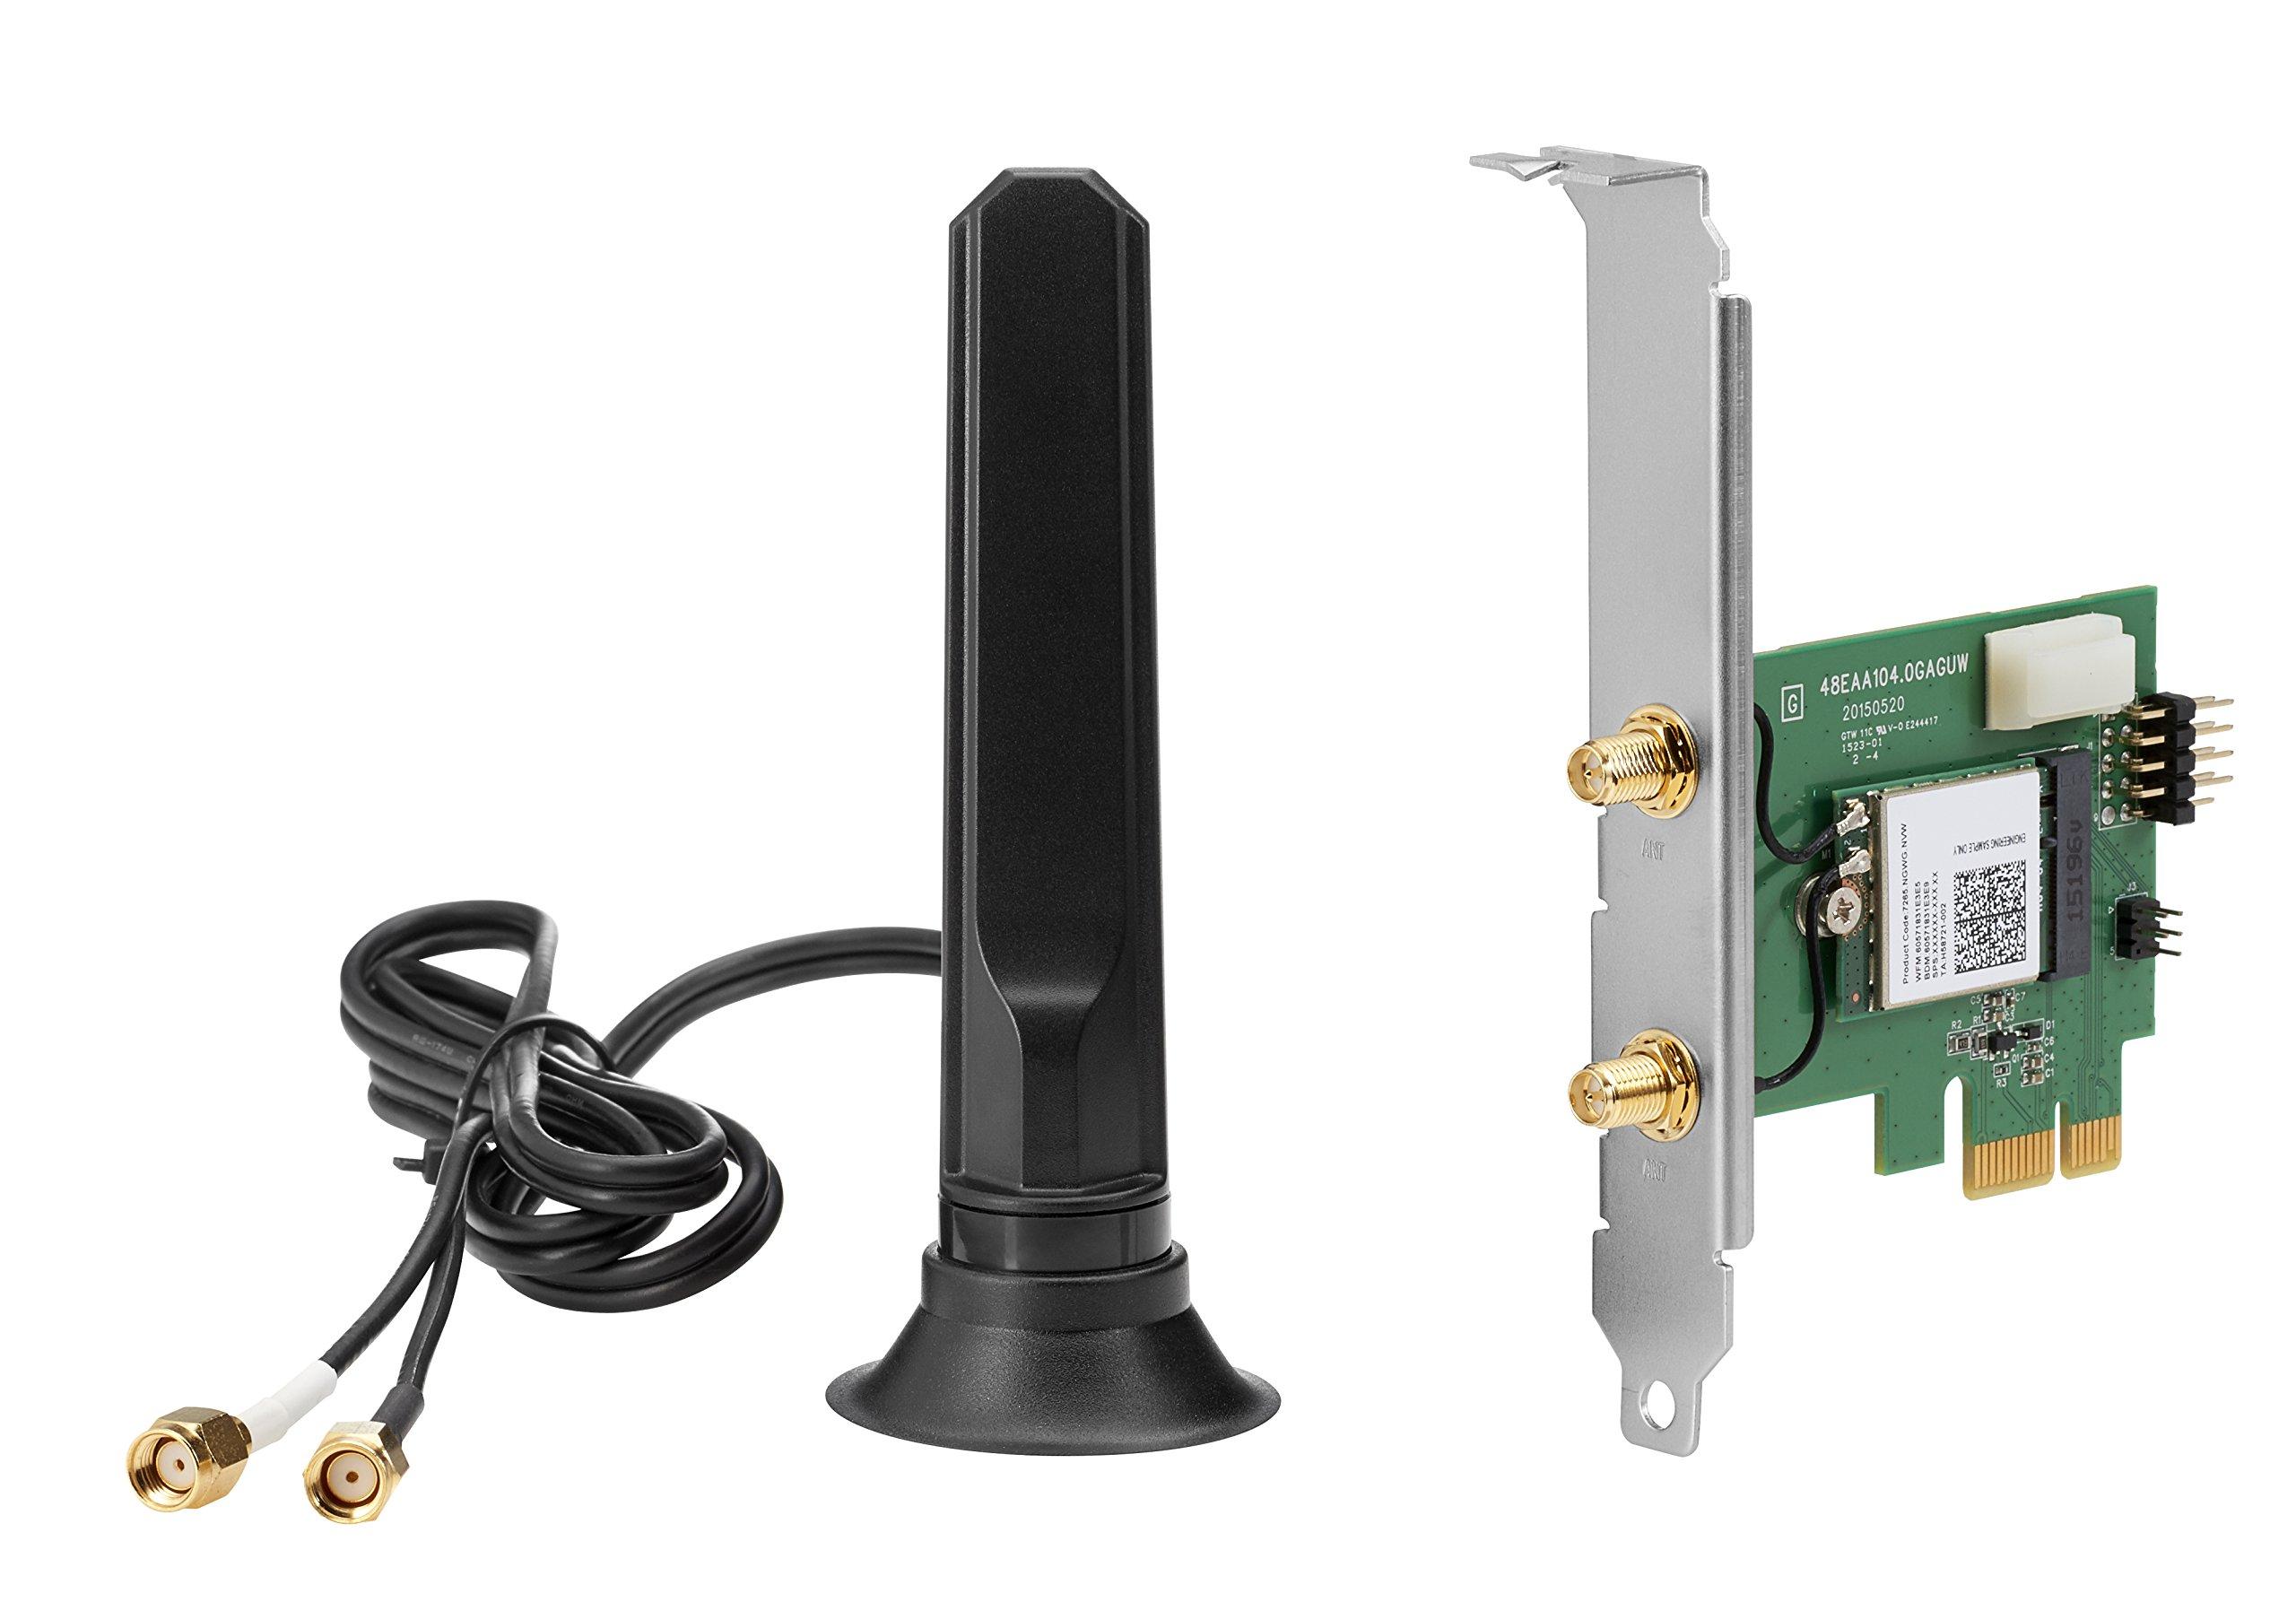 HP 7265 IEEE 802.11ac - Wi-Fi/Bluetooth Combo Adapter for Desktop Computer